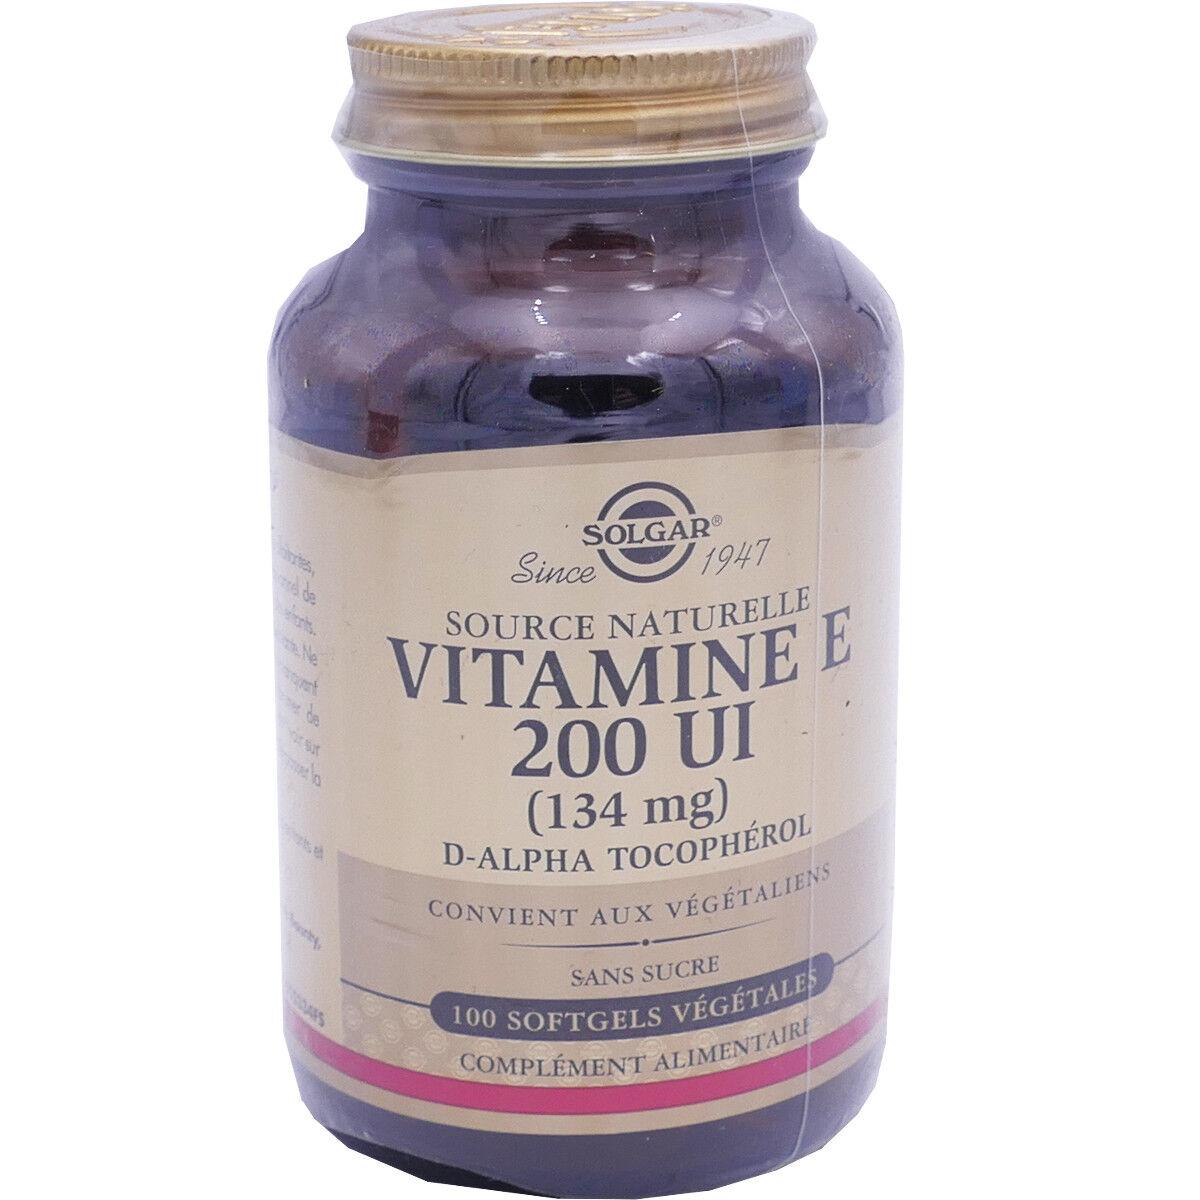 Solgar vitamine e 200 ui 134mg 100 softgels vegetales